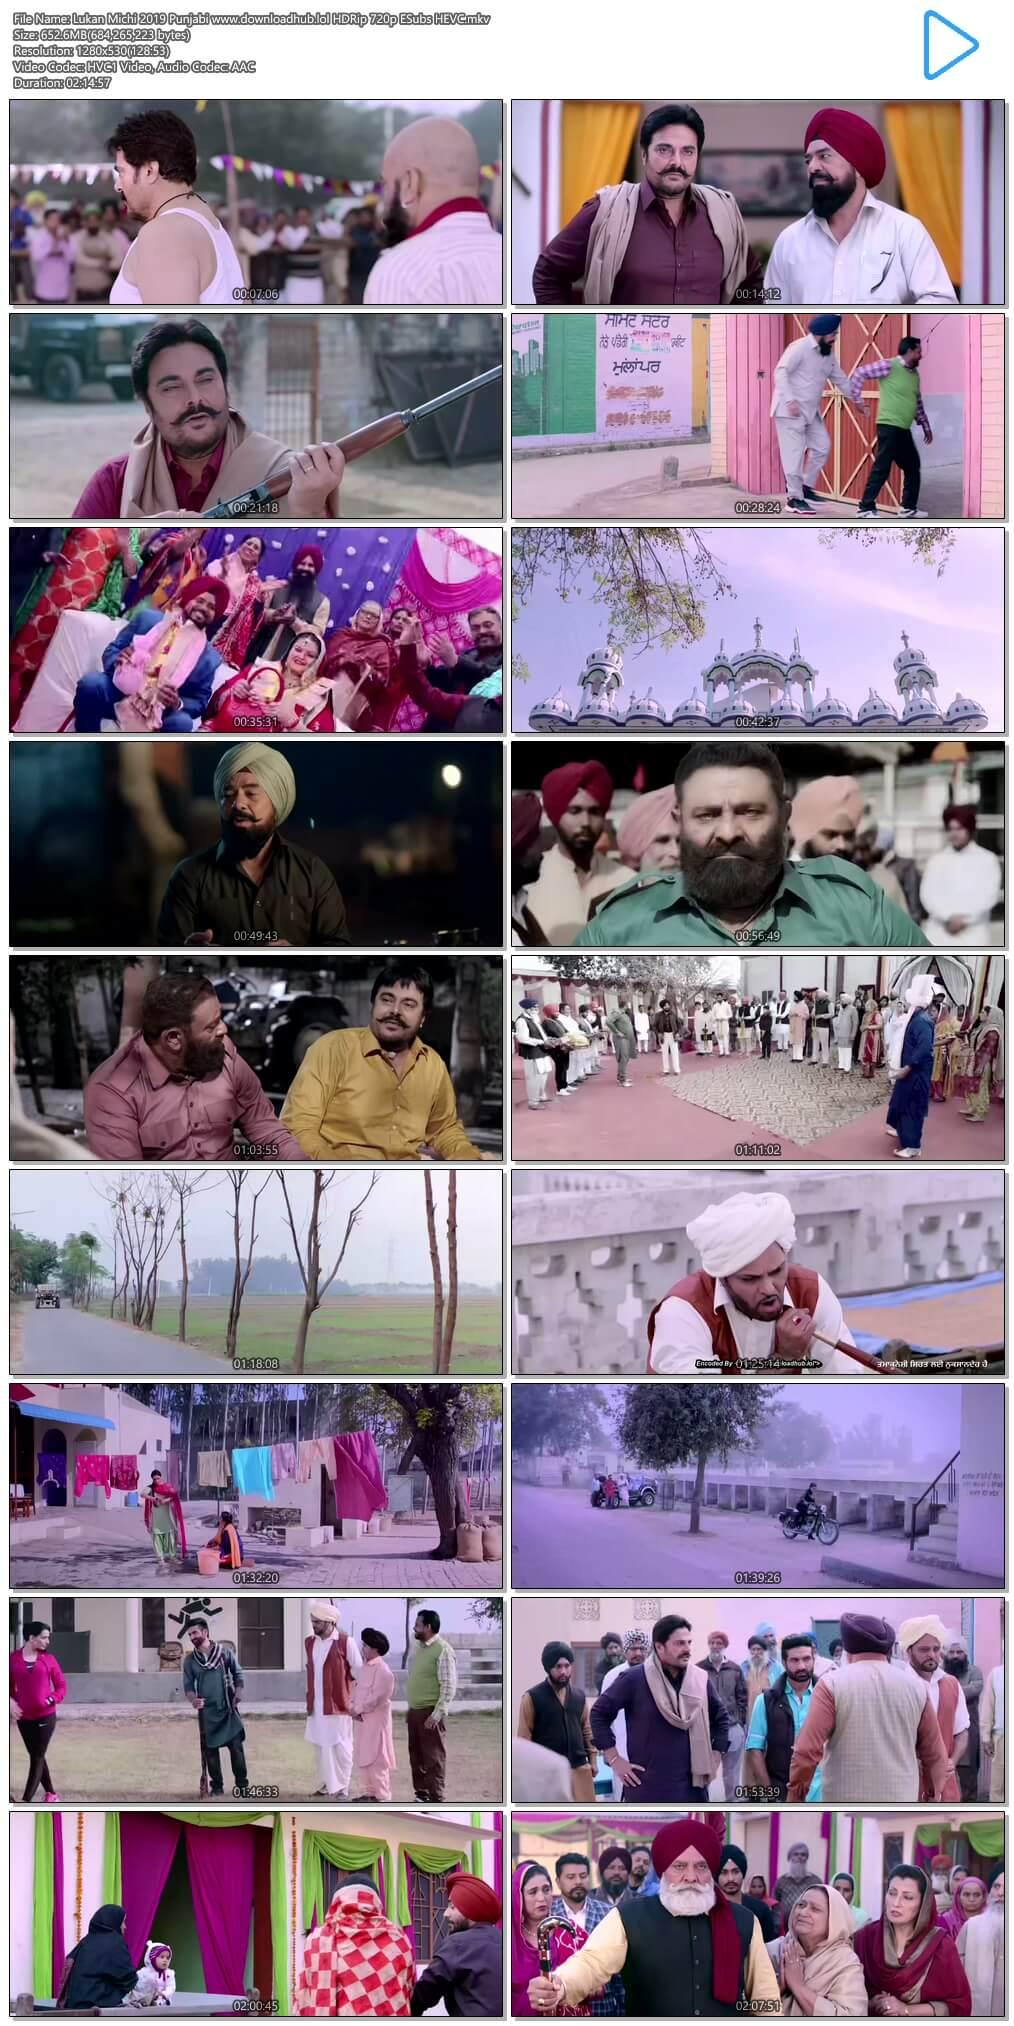 Lukan Michi 2019 Punjabi 650MB HDRip 720p ESubs HEVC